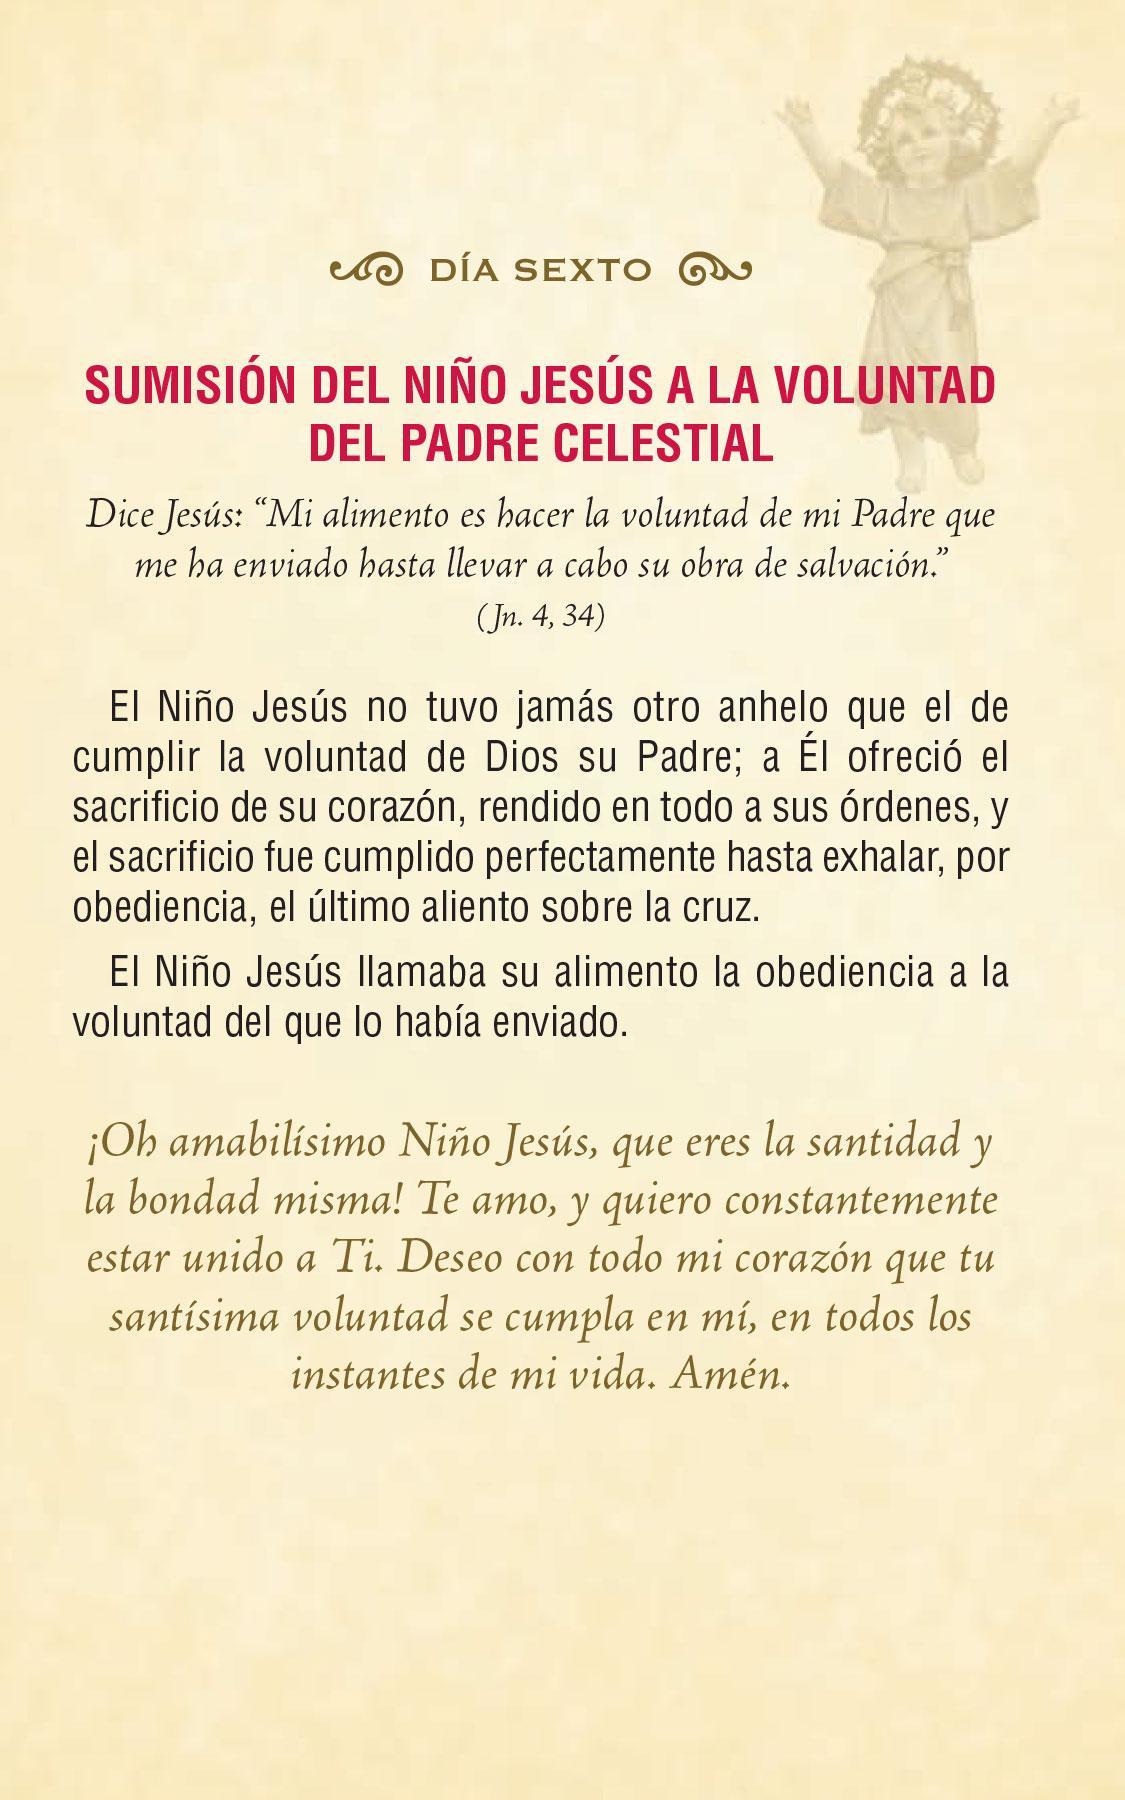 Divinio Niño Jesús - día sexto